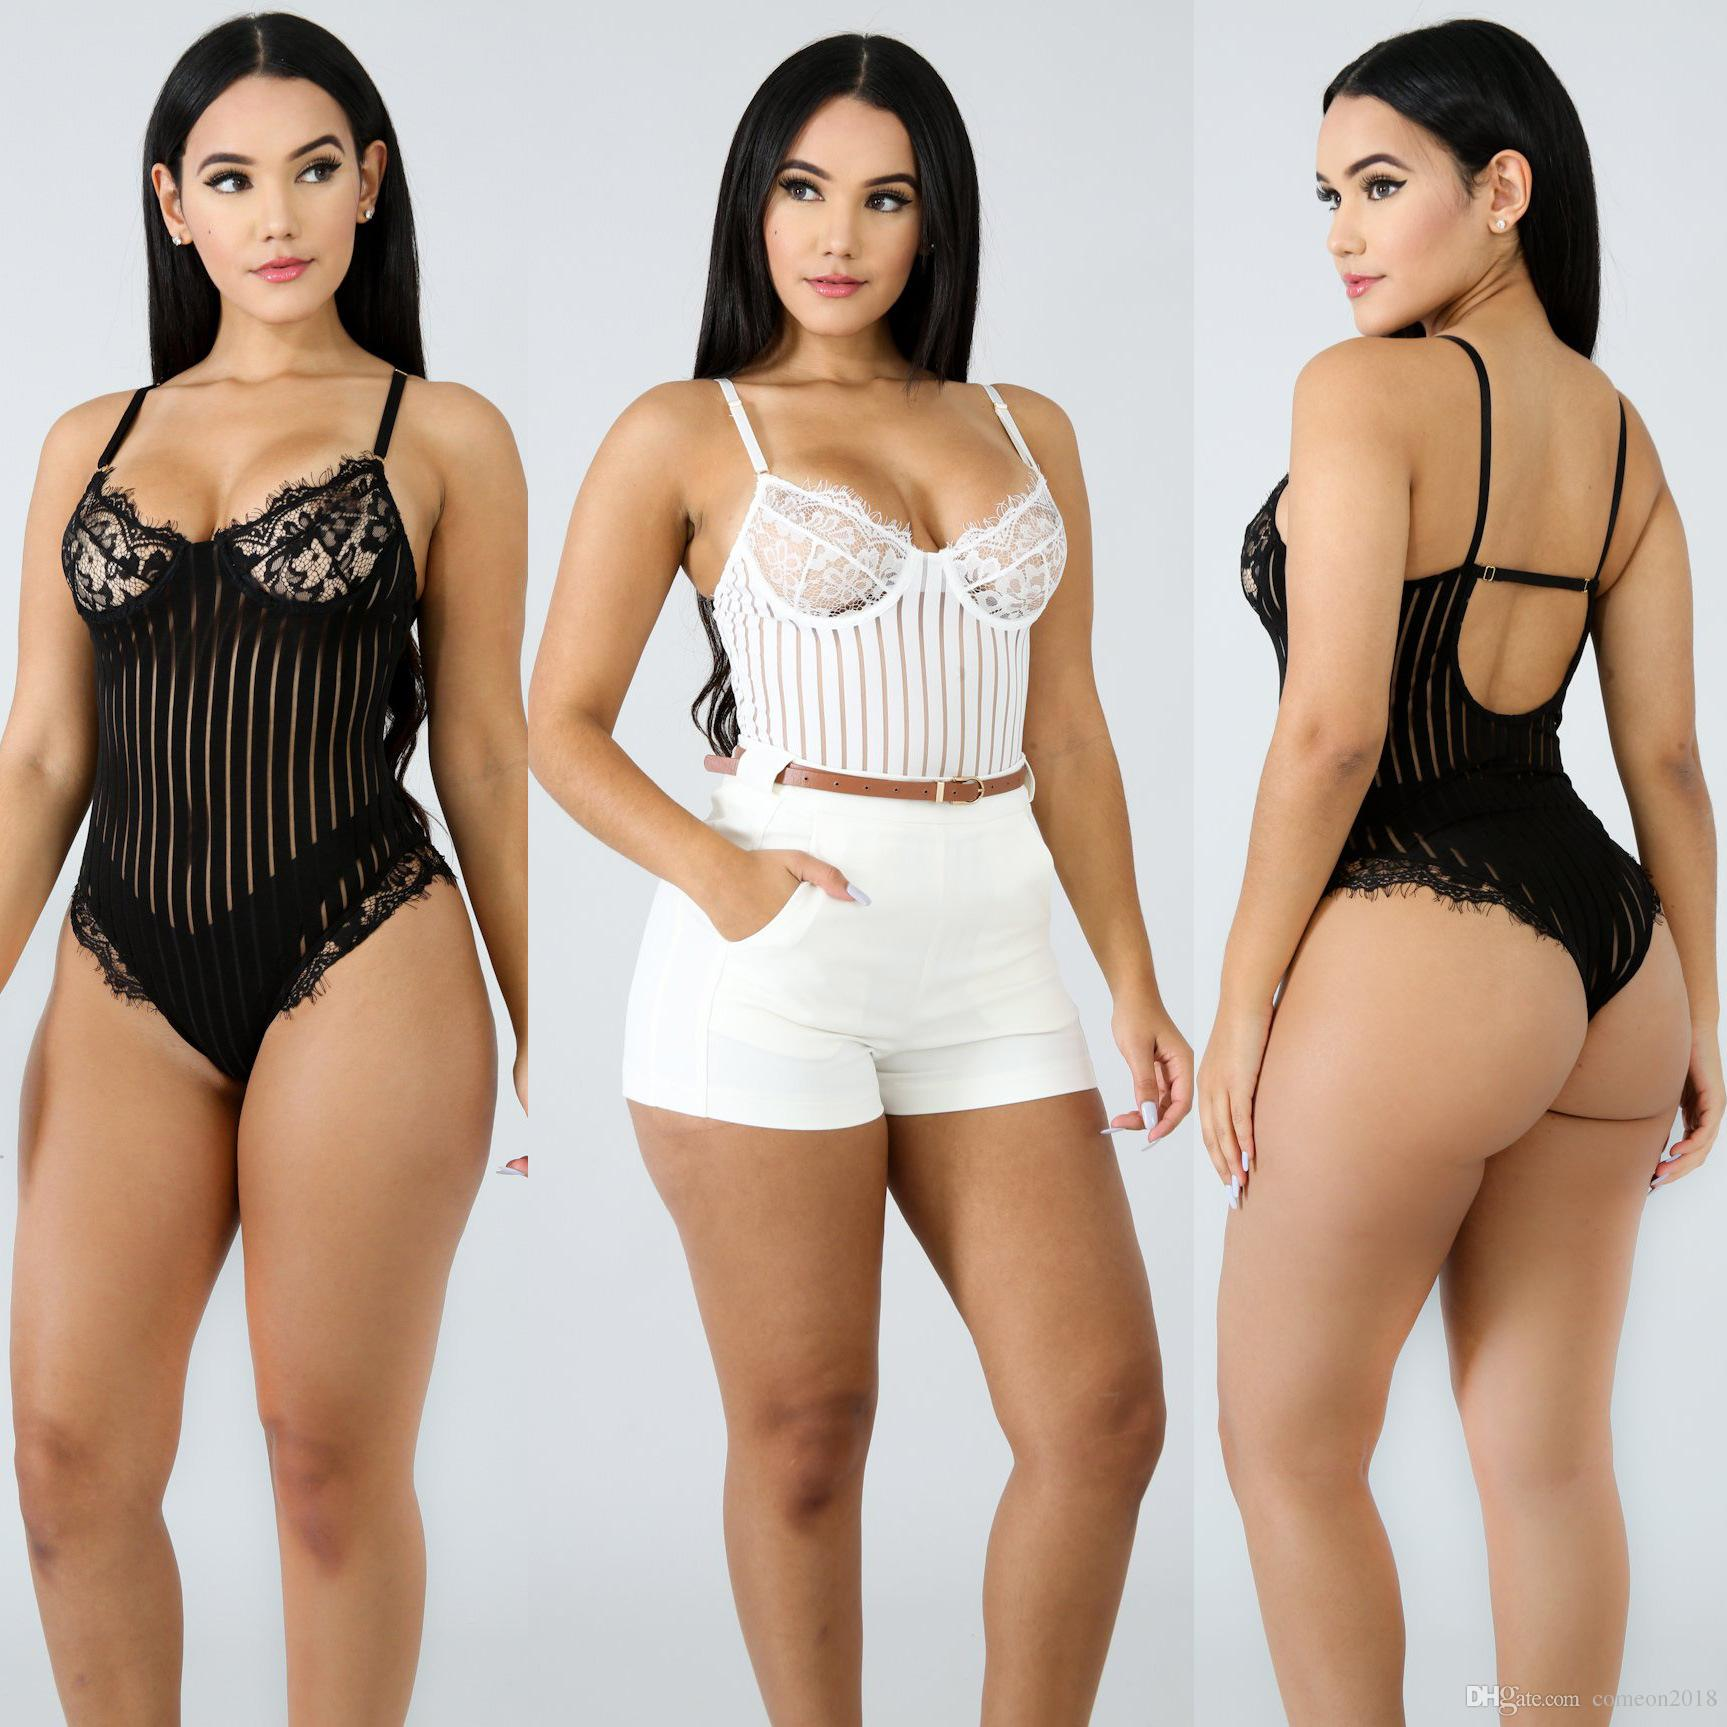 e5571b1c23 Hot Selling Women Clothes Overalls Women Jumpsuits Lace Strap ...